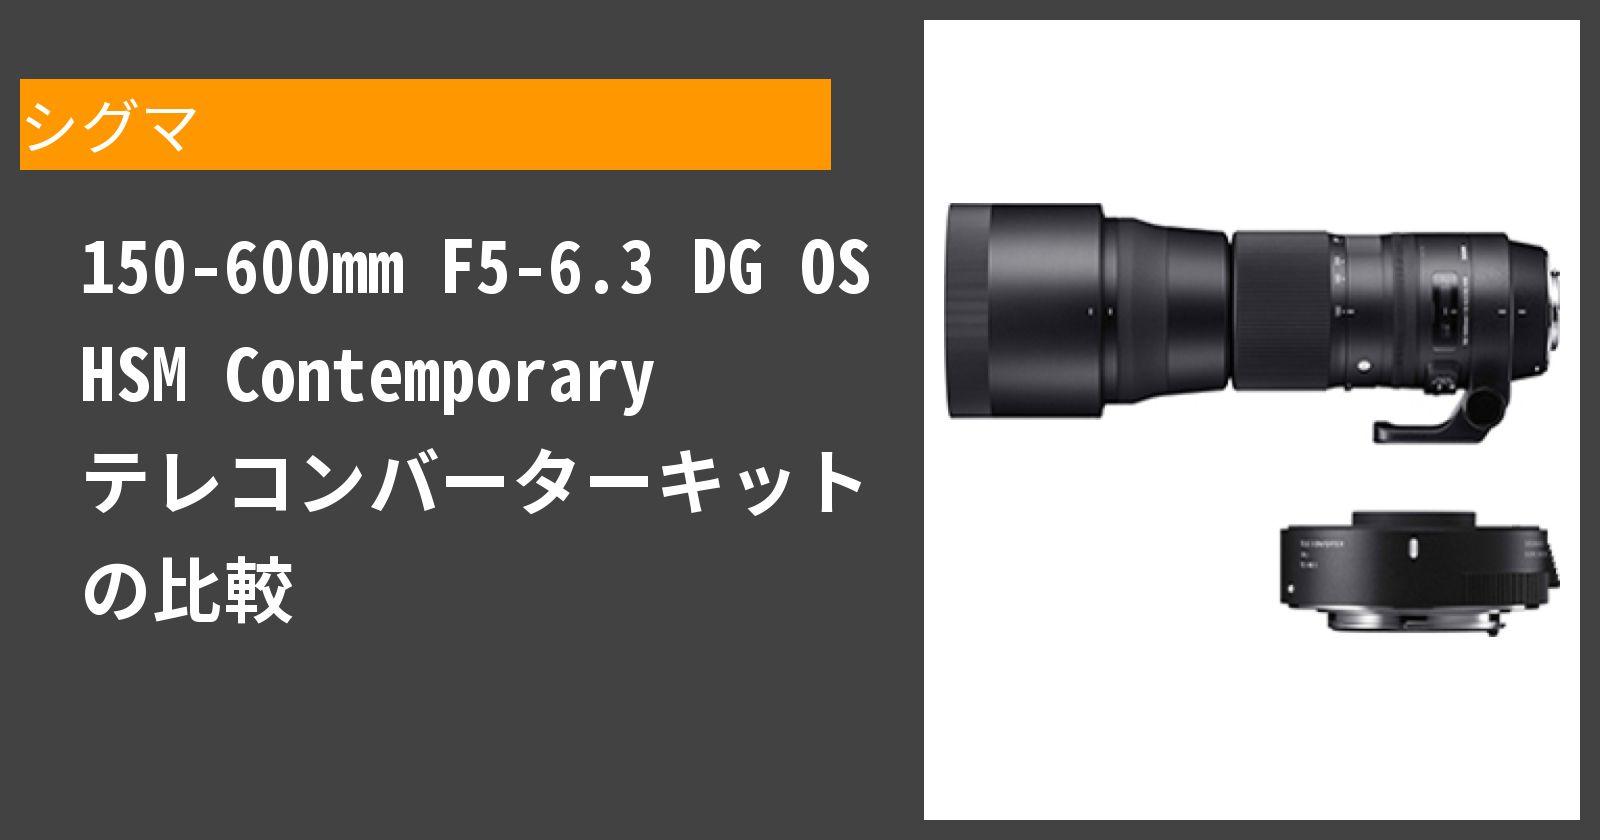 150-600mm F5-6.3 DG OS HSM Contemporary テレコンバーターキットを徹底評価